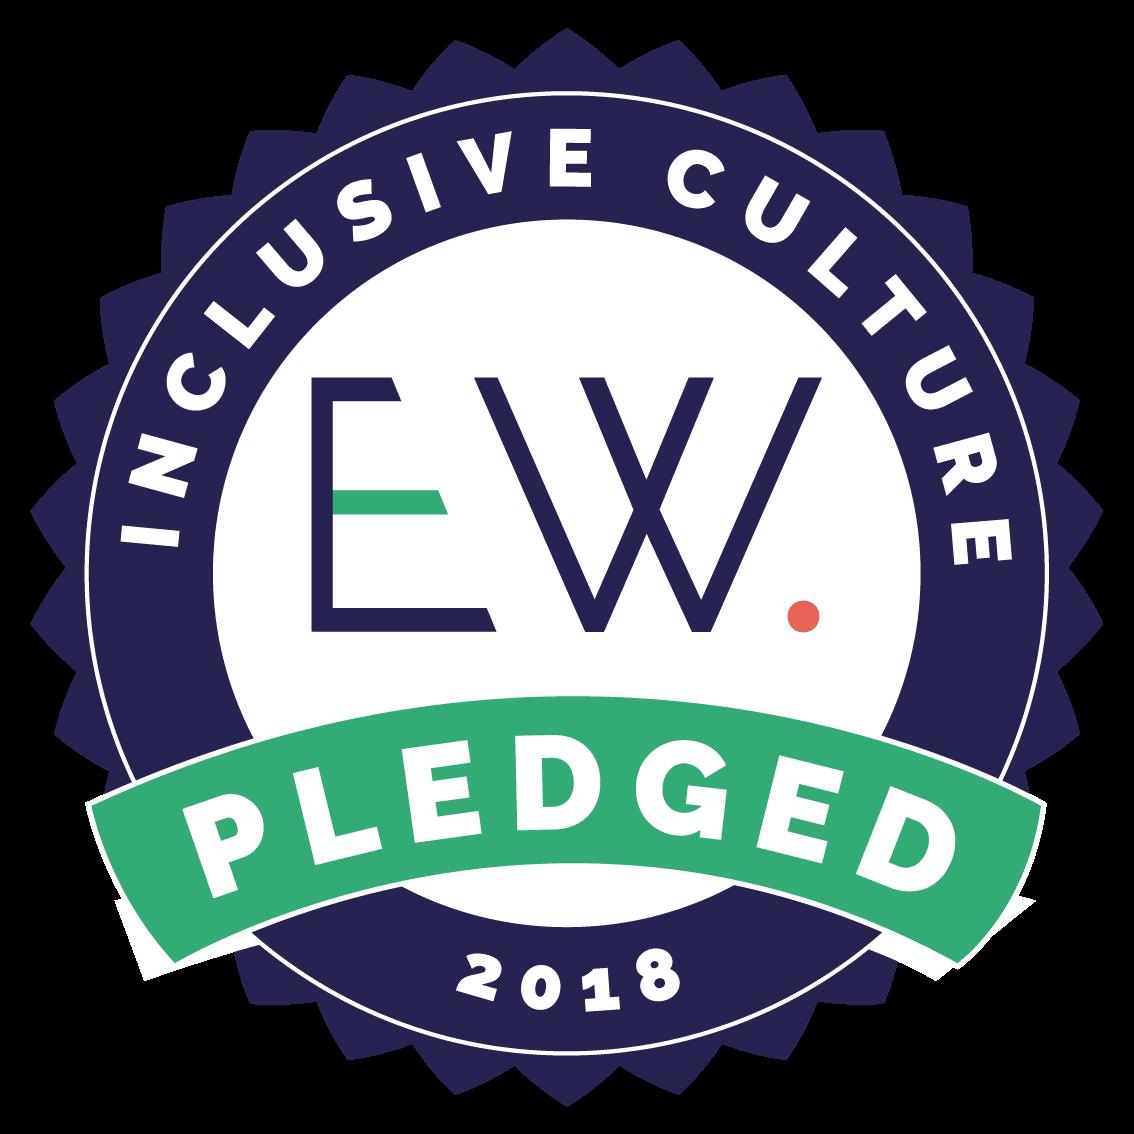 ew-group-inclusive-culture-pledged-2018